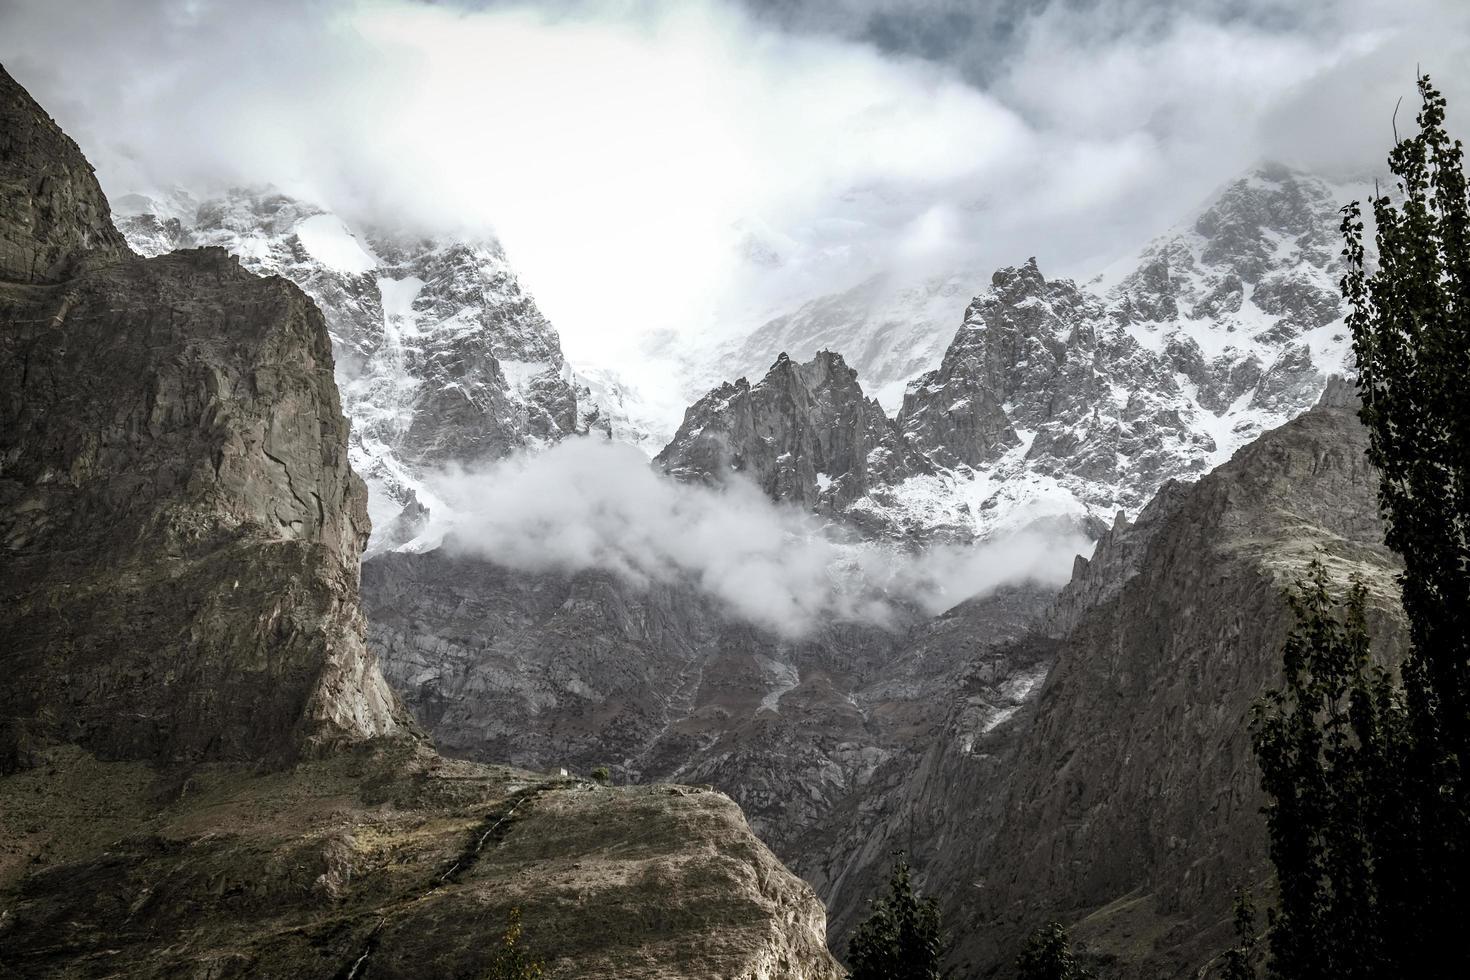 montagna di ultar innevata foto